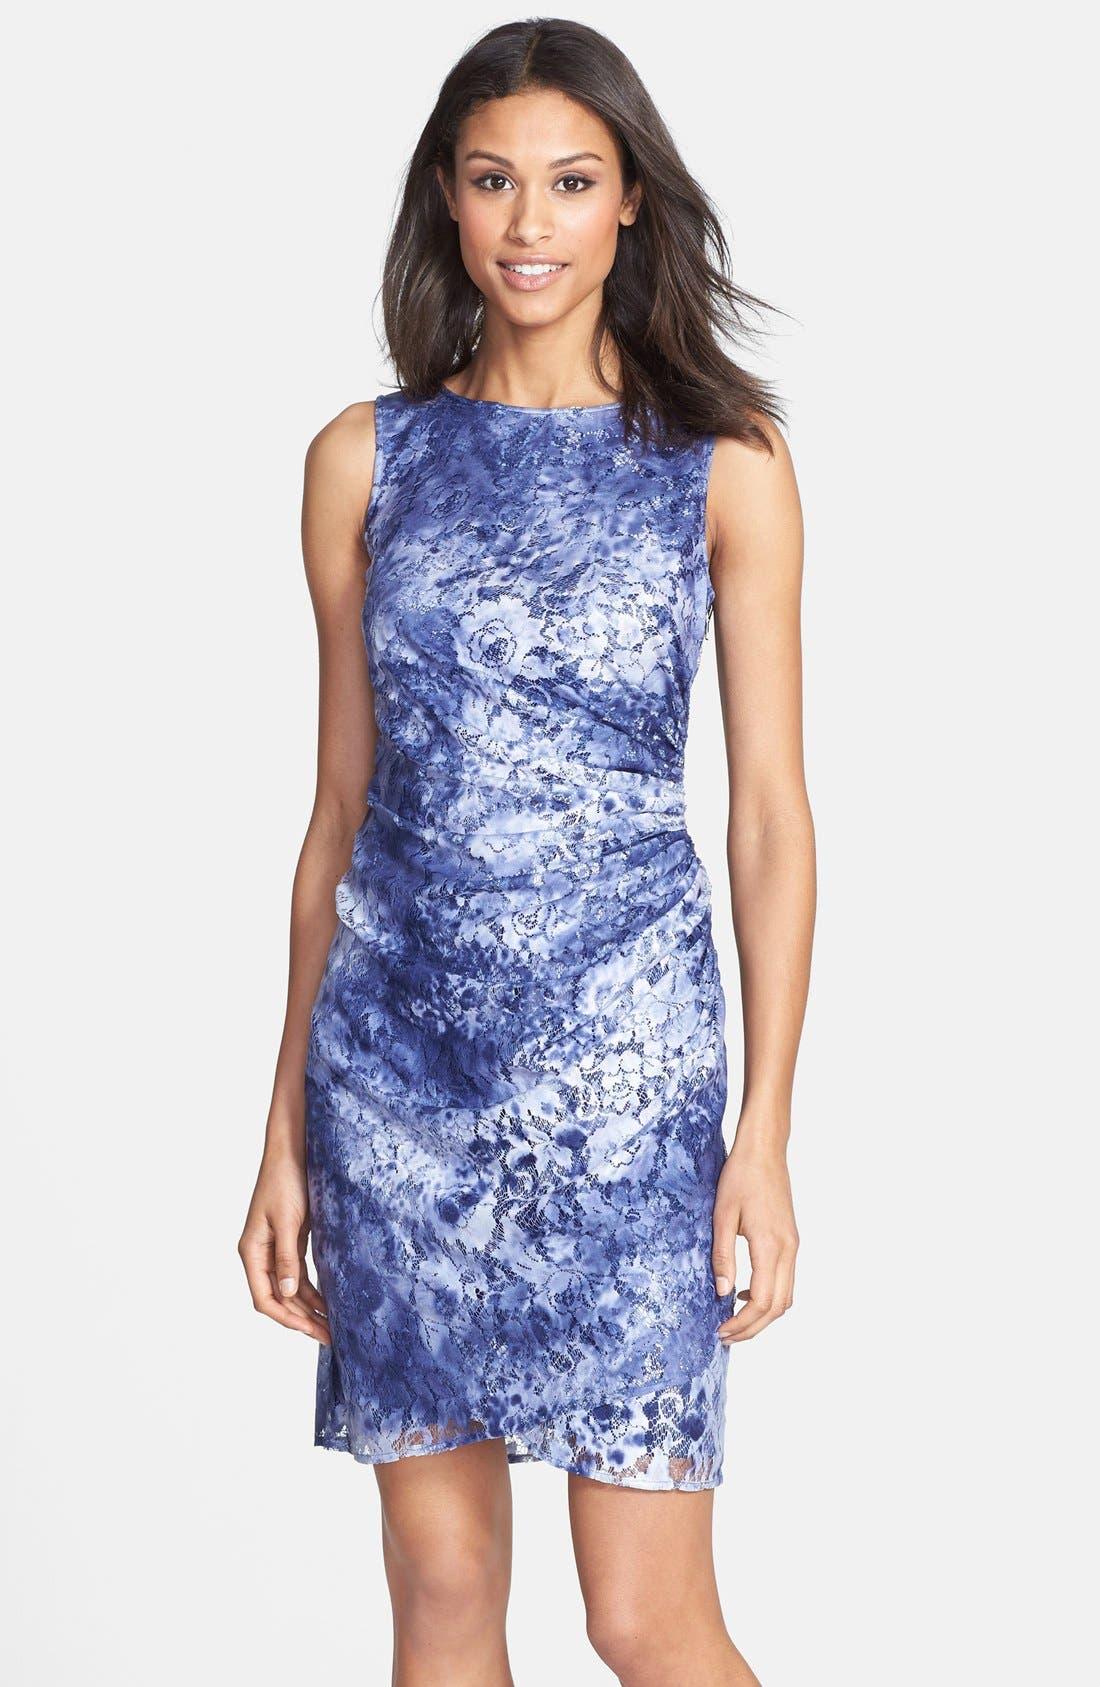 Main Image - Adrianna Papell Tie Dye Lace Sheath Dress (Regular & Petite)